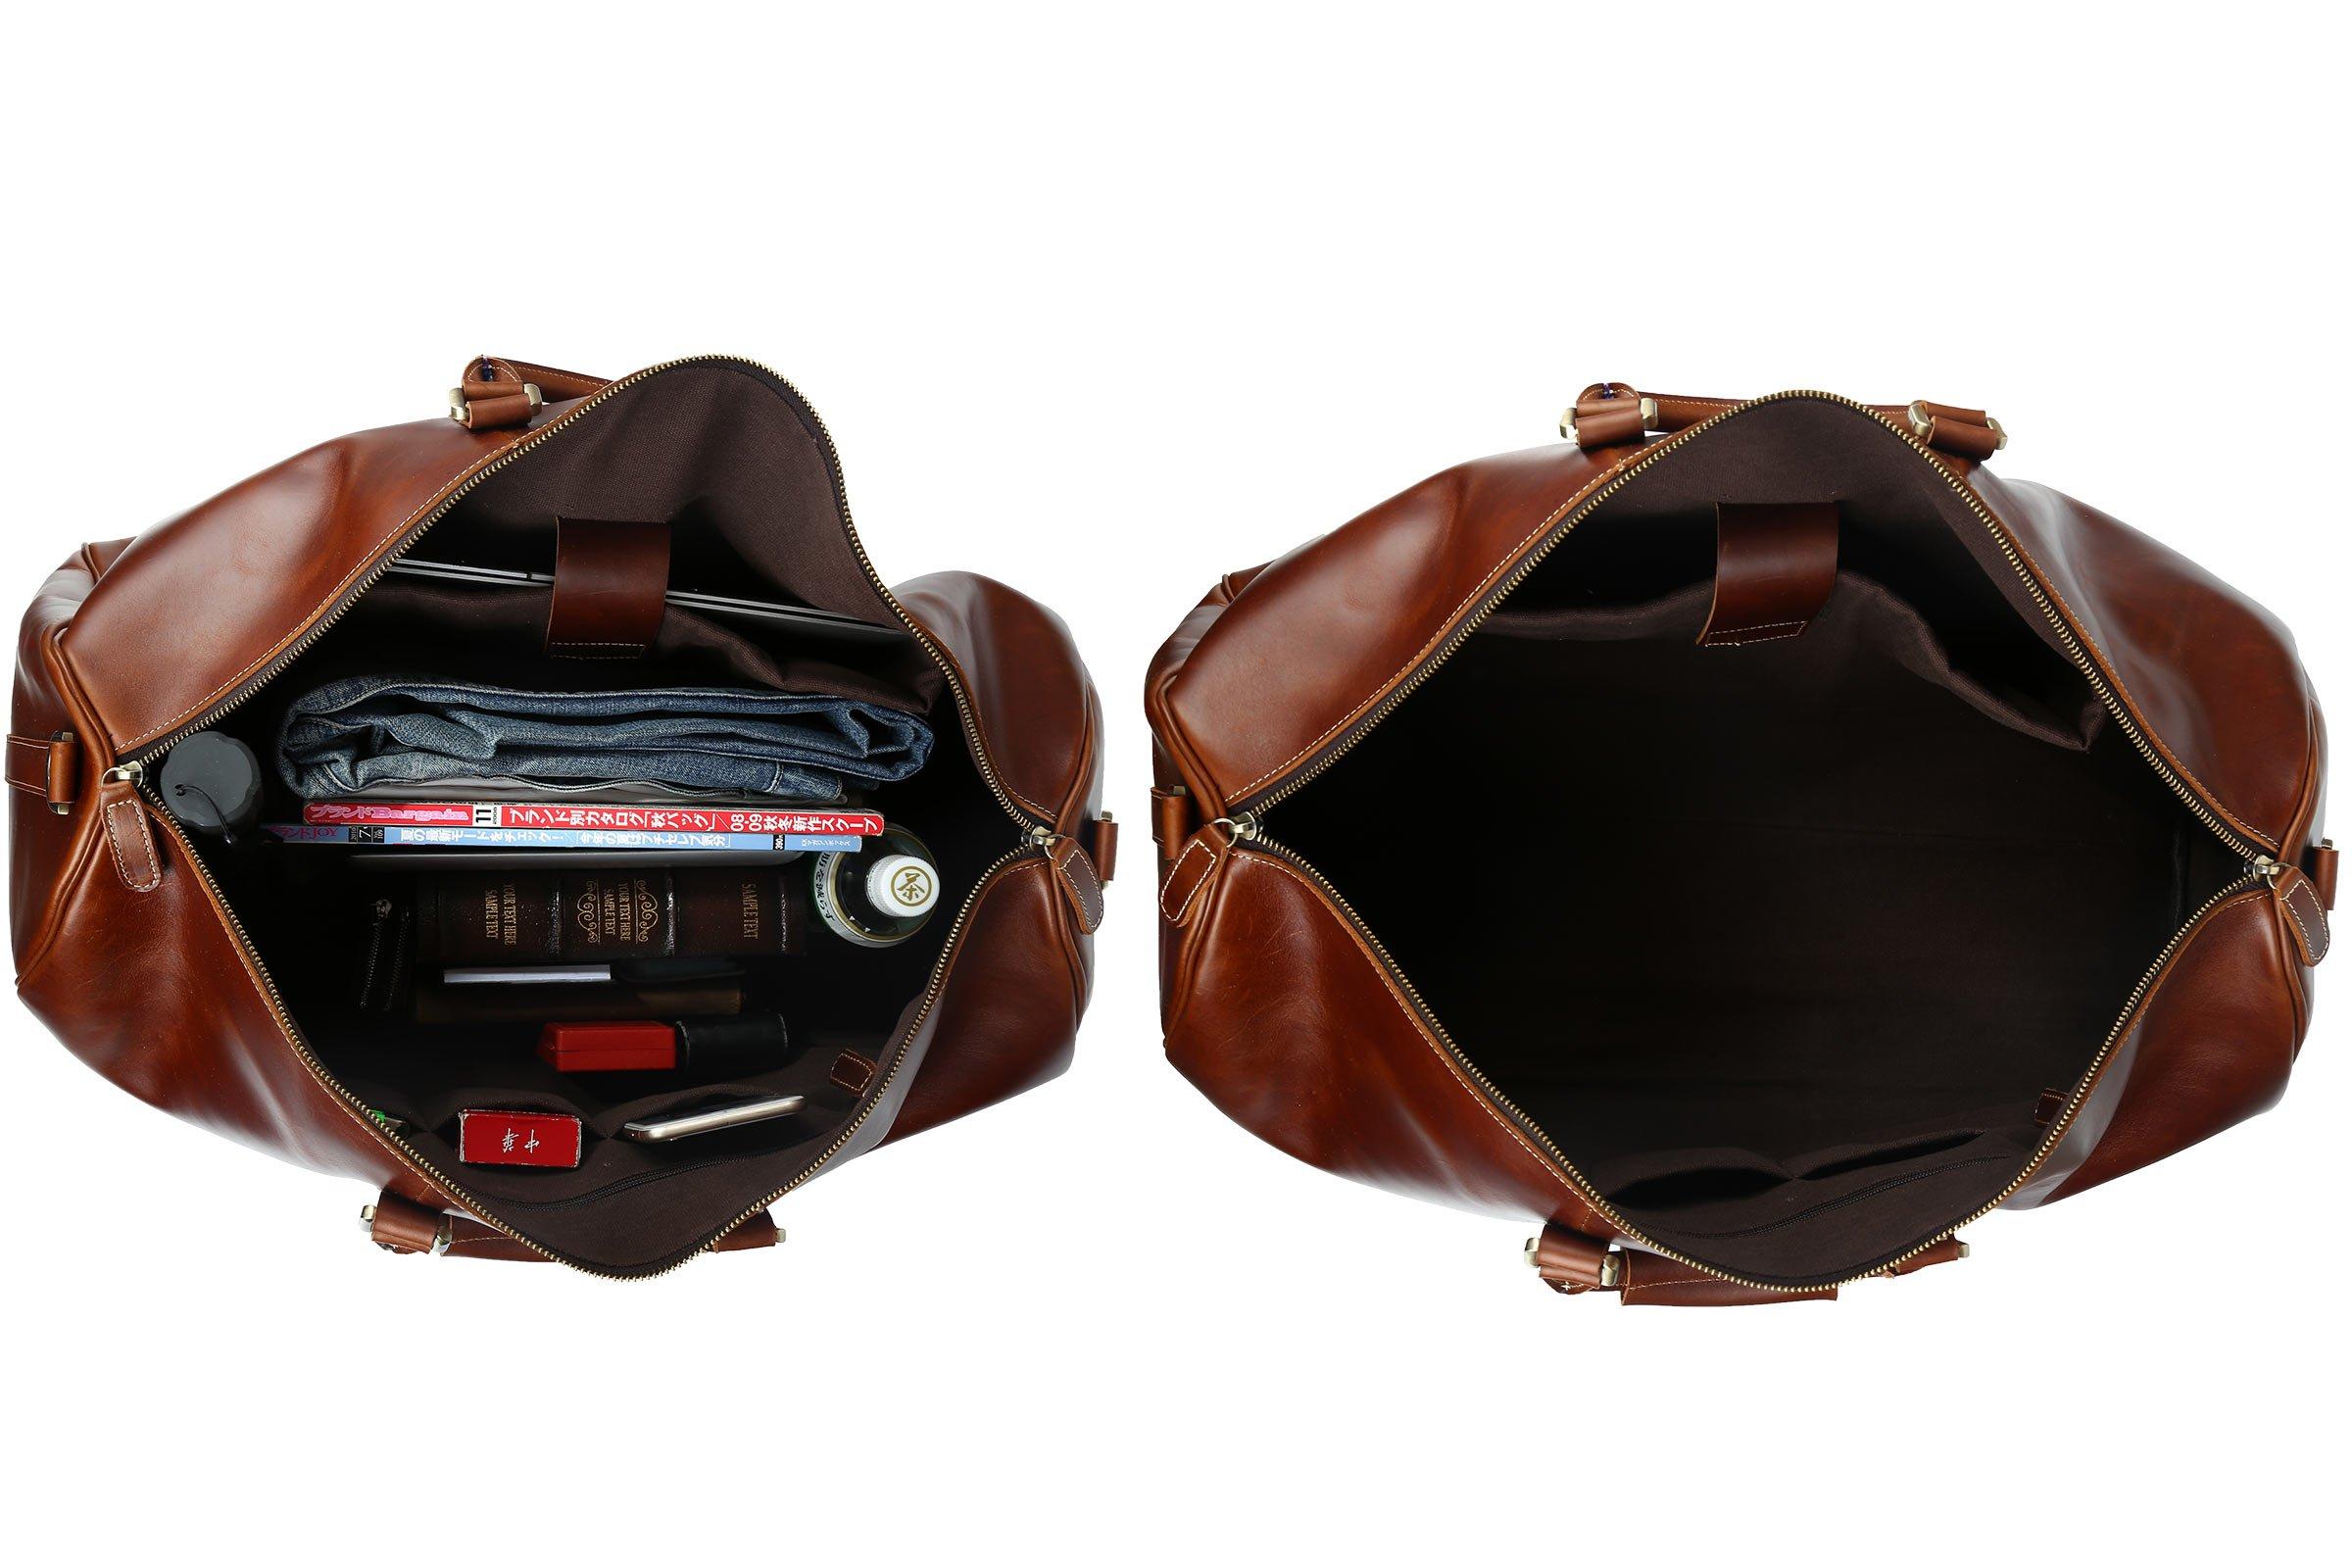 Huntvp Mens Leather Travel Duffel Bag Vintage Weekender Carry On Brown Luggage Bag by Huntvp (Image #6)